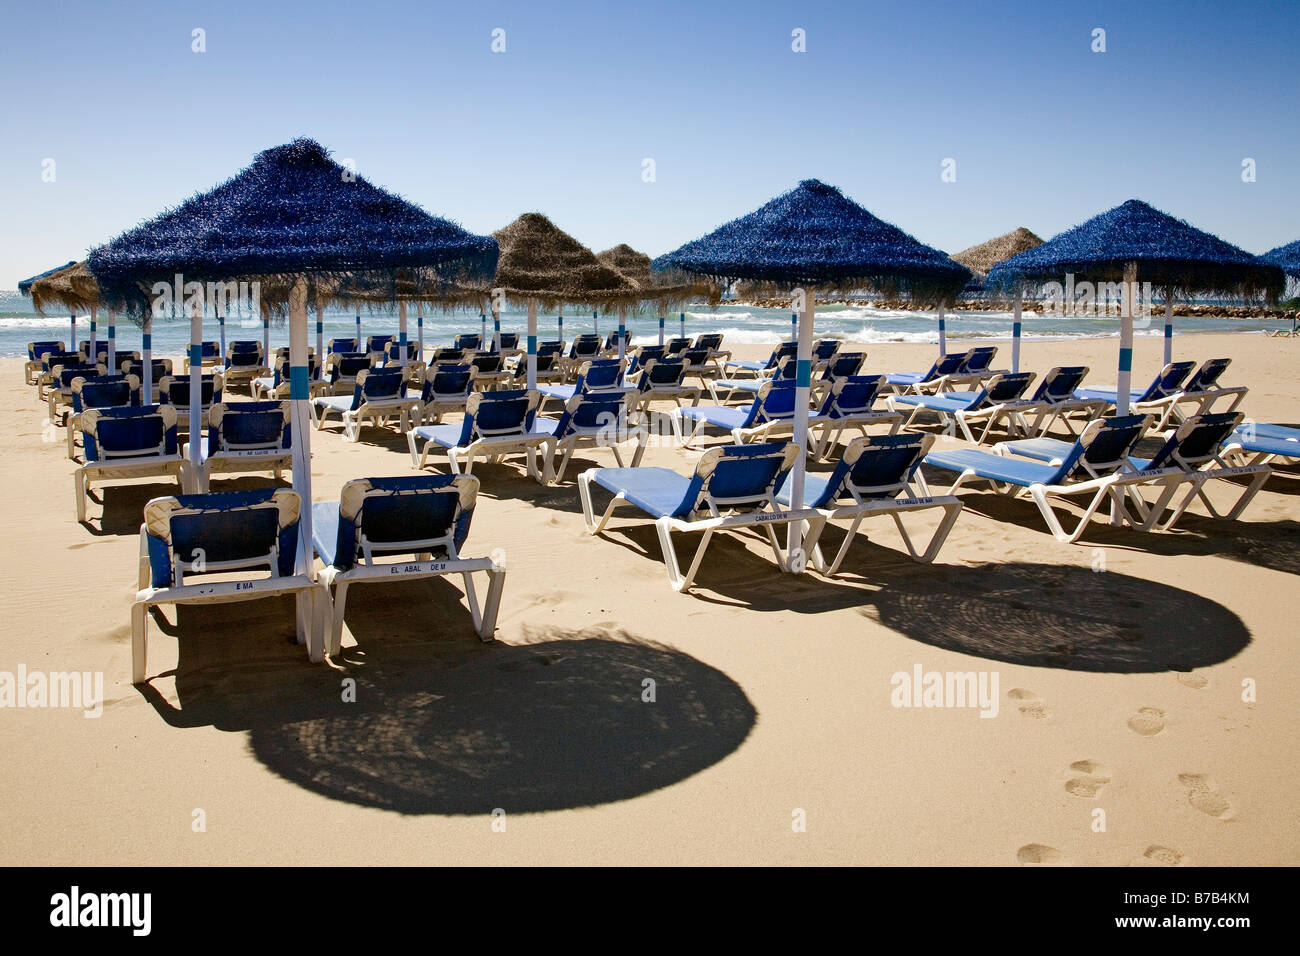 Umbrellas and hammocks on Cabopino beach Marbella Malaga sun coast Andalusia Spain - Stock Image